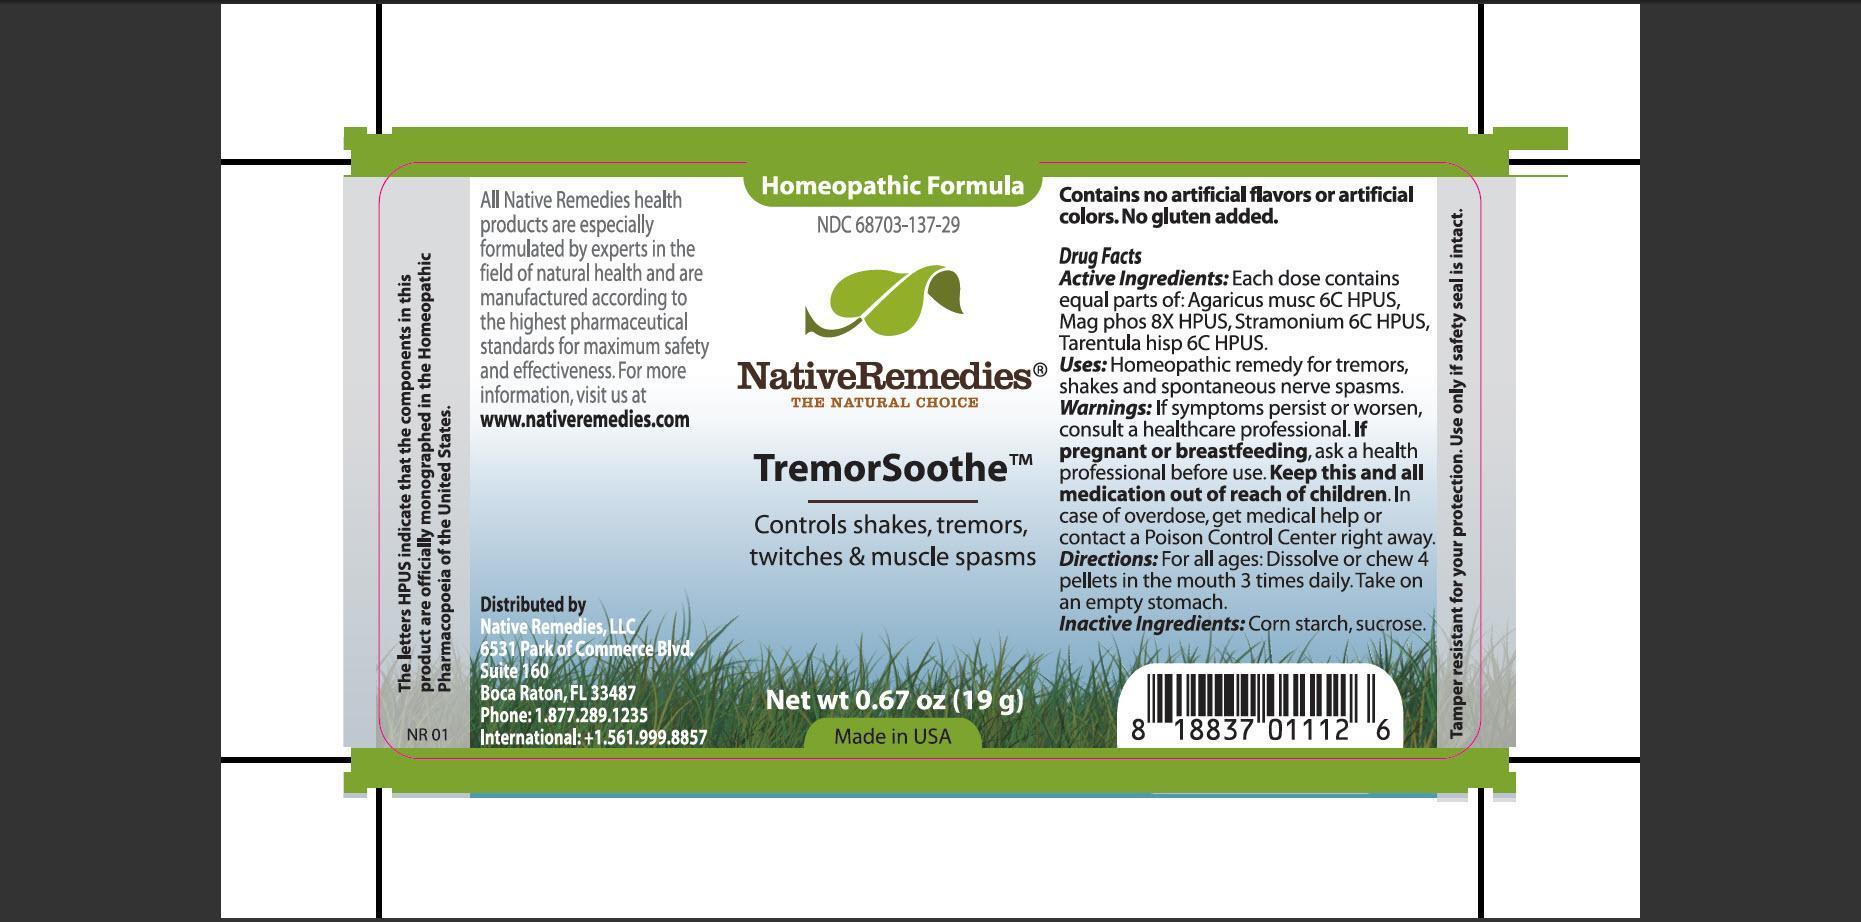 Tremorsoothe (Agaricus Musc, Mag Phos, Stramonium, Tarentula Hisp) Pellet [Native Remedies, Llc]